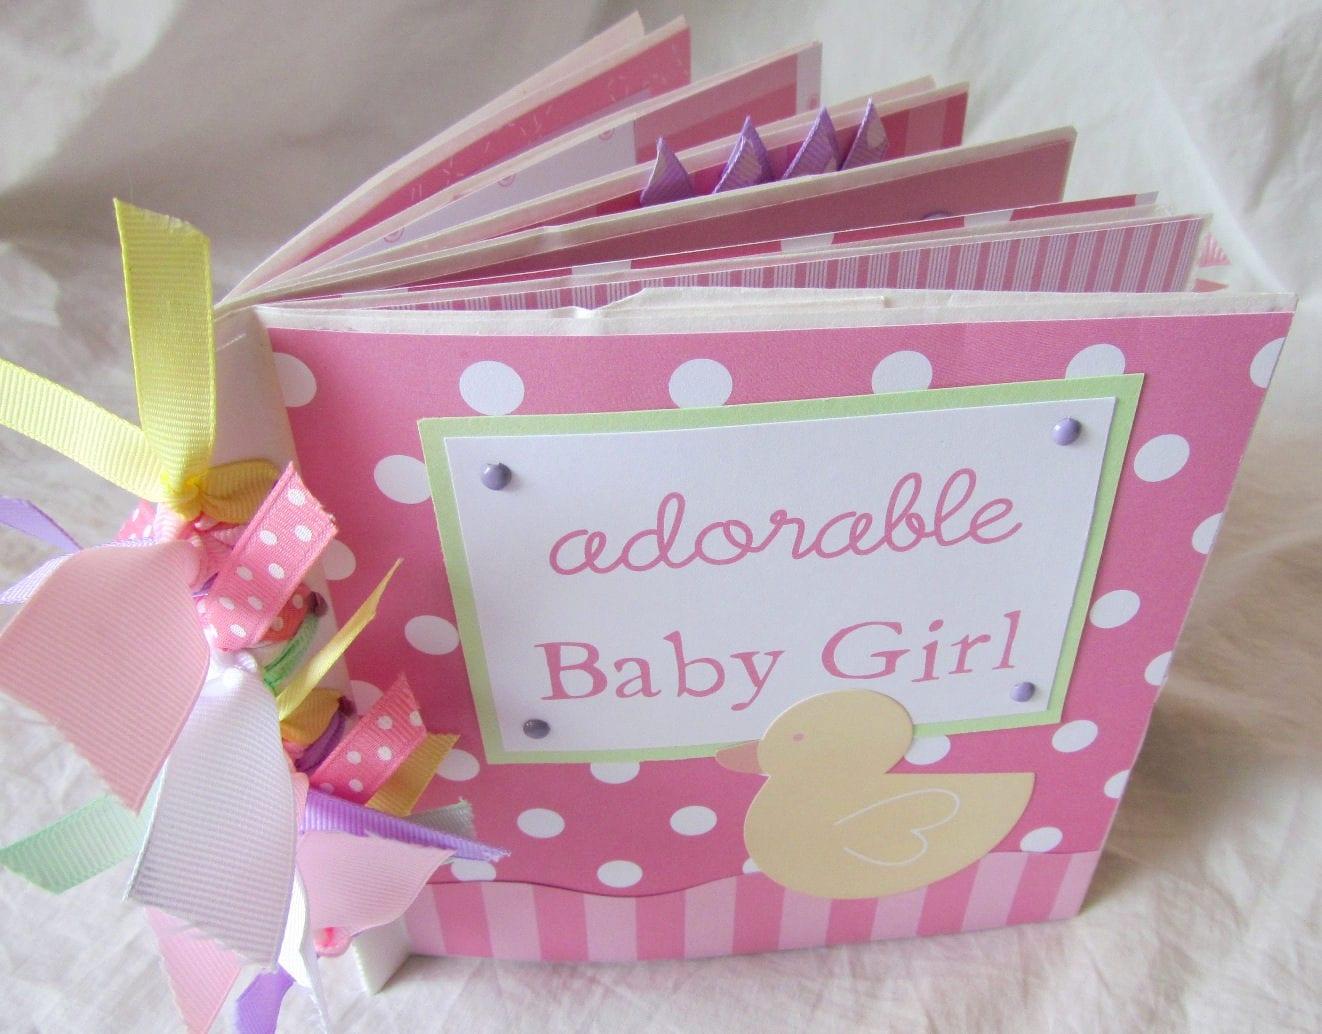 Mini Album BABY GIRL 6x6 Premade Scrapbook PaPeR BaG book